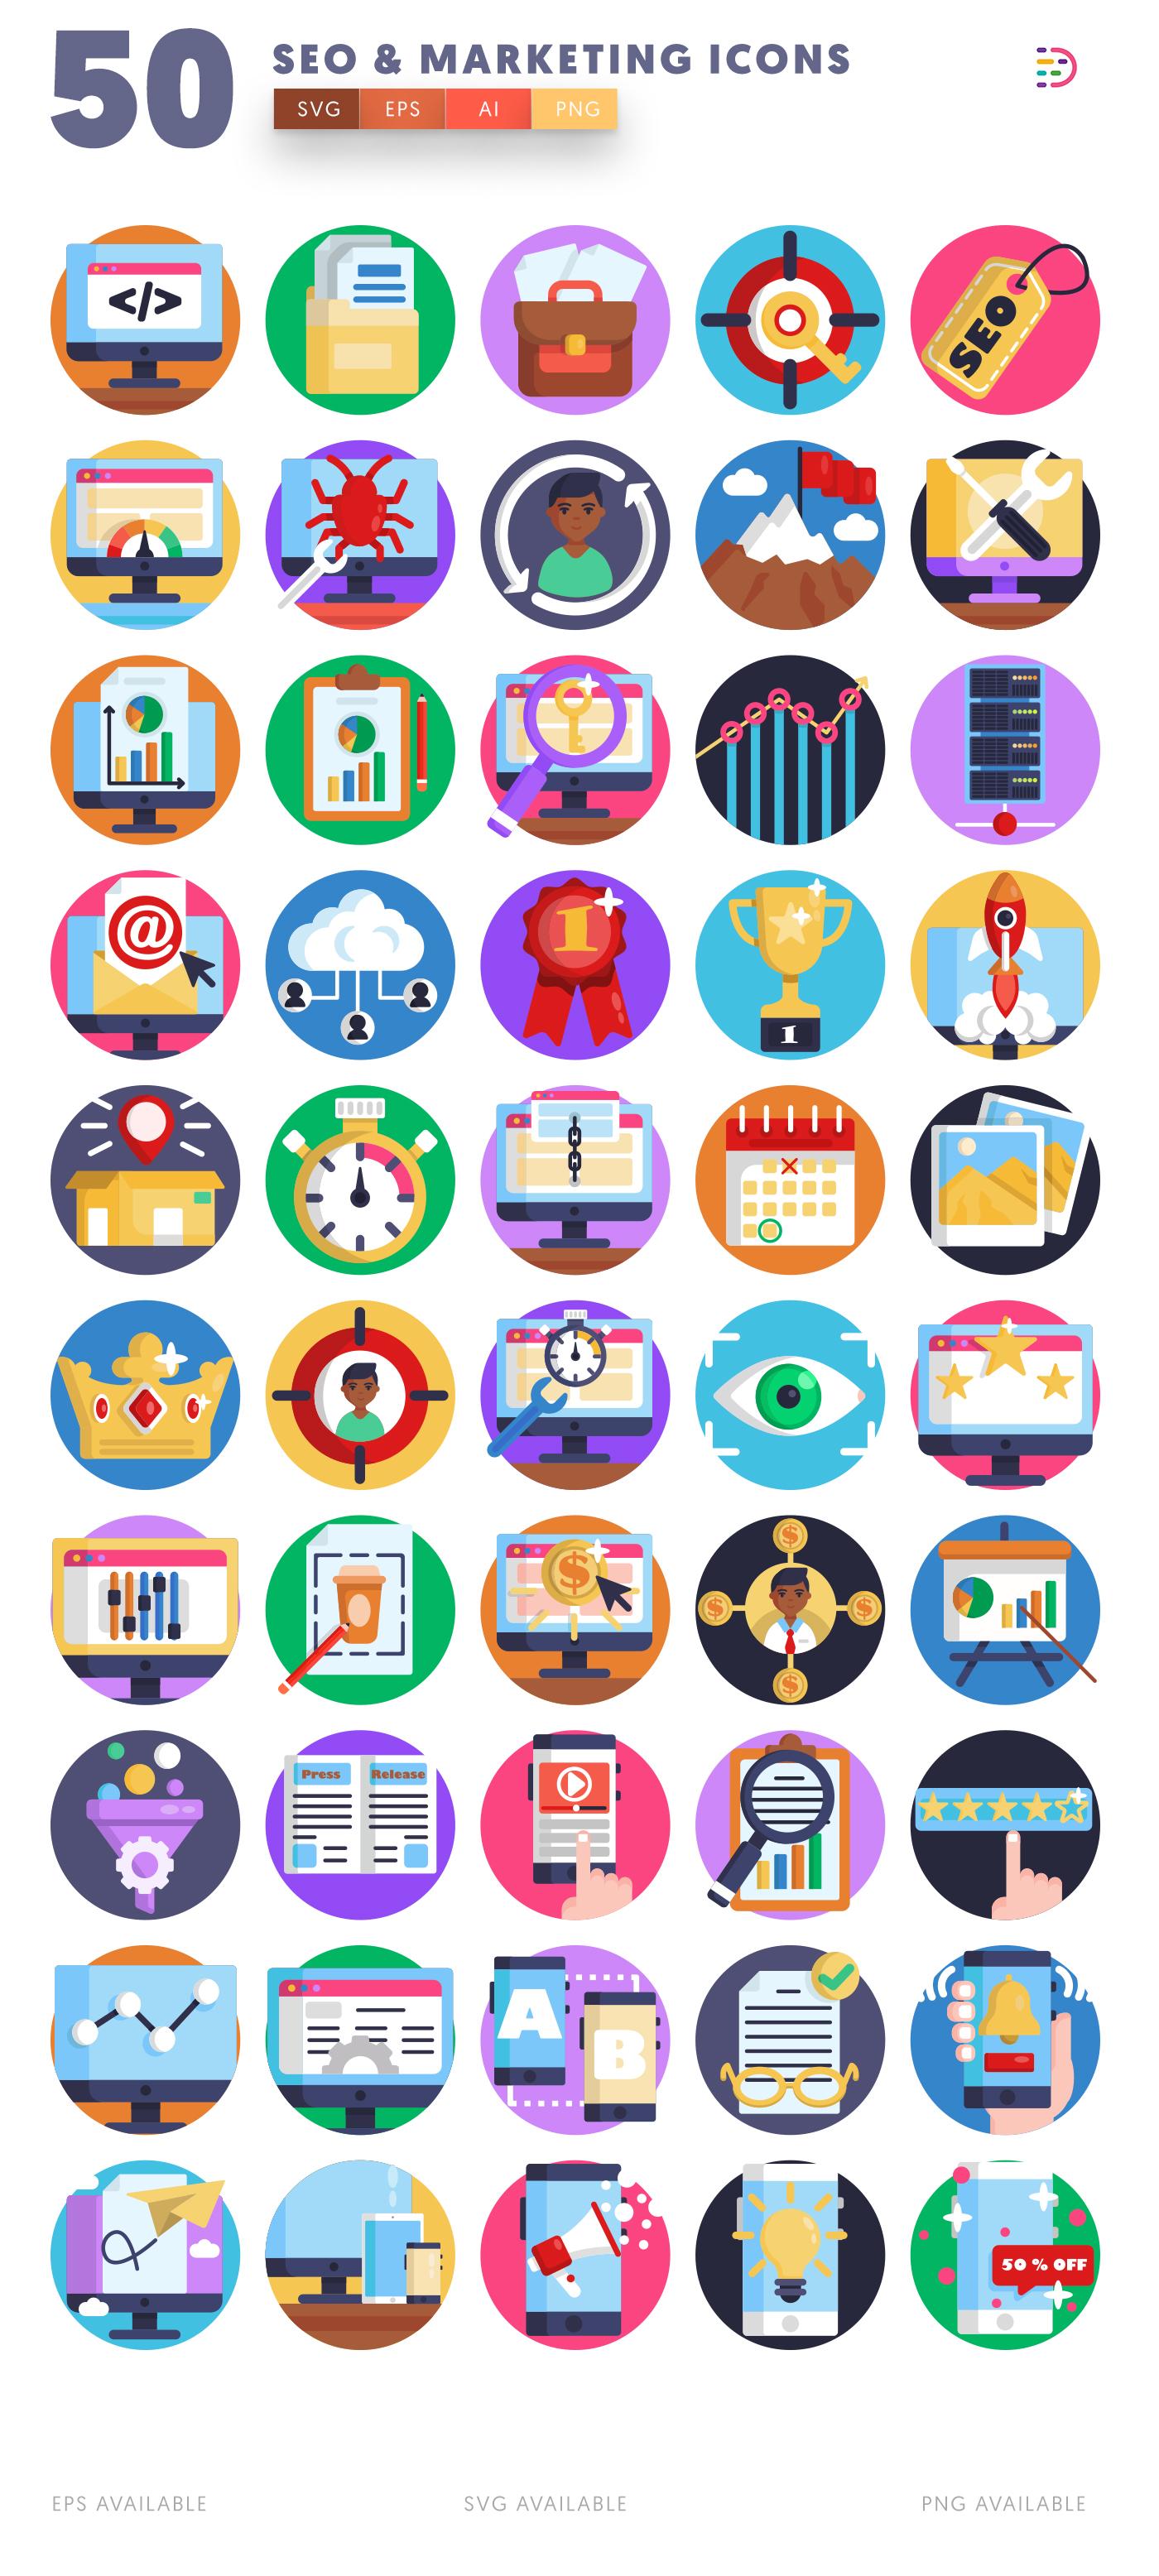 50 Seo & Marketing Icons list